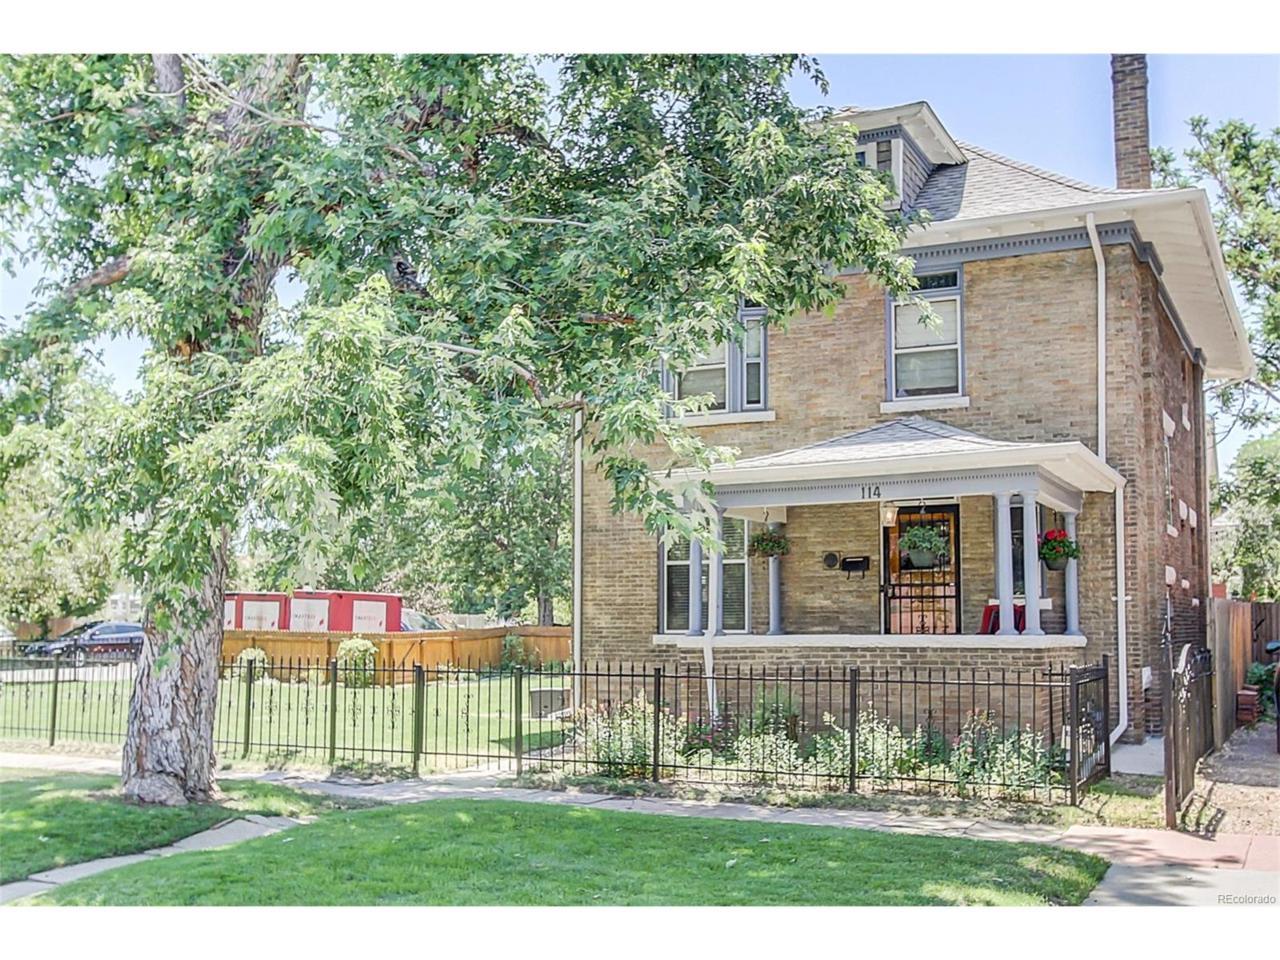 114 W 3rd Avenue, Denver, CO 80223 (MLS #9510806) :: 8z Real Estate